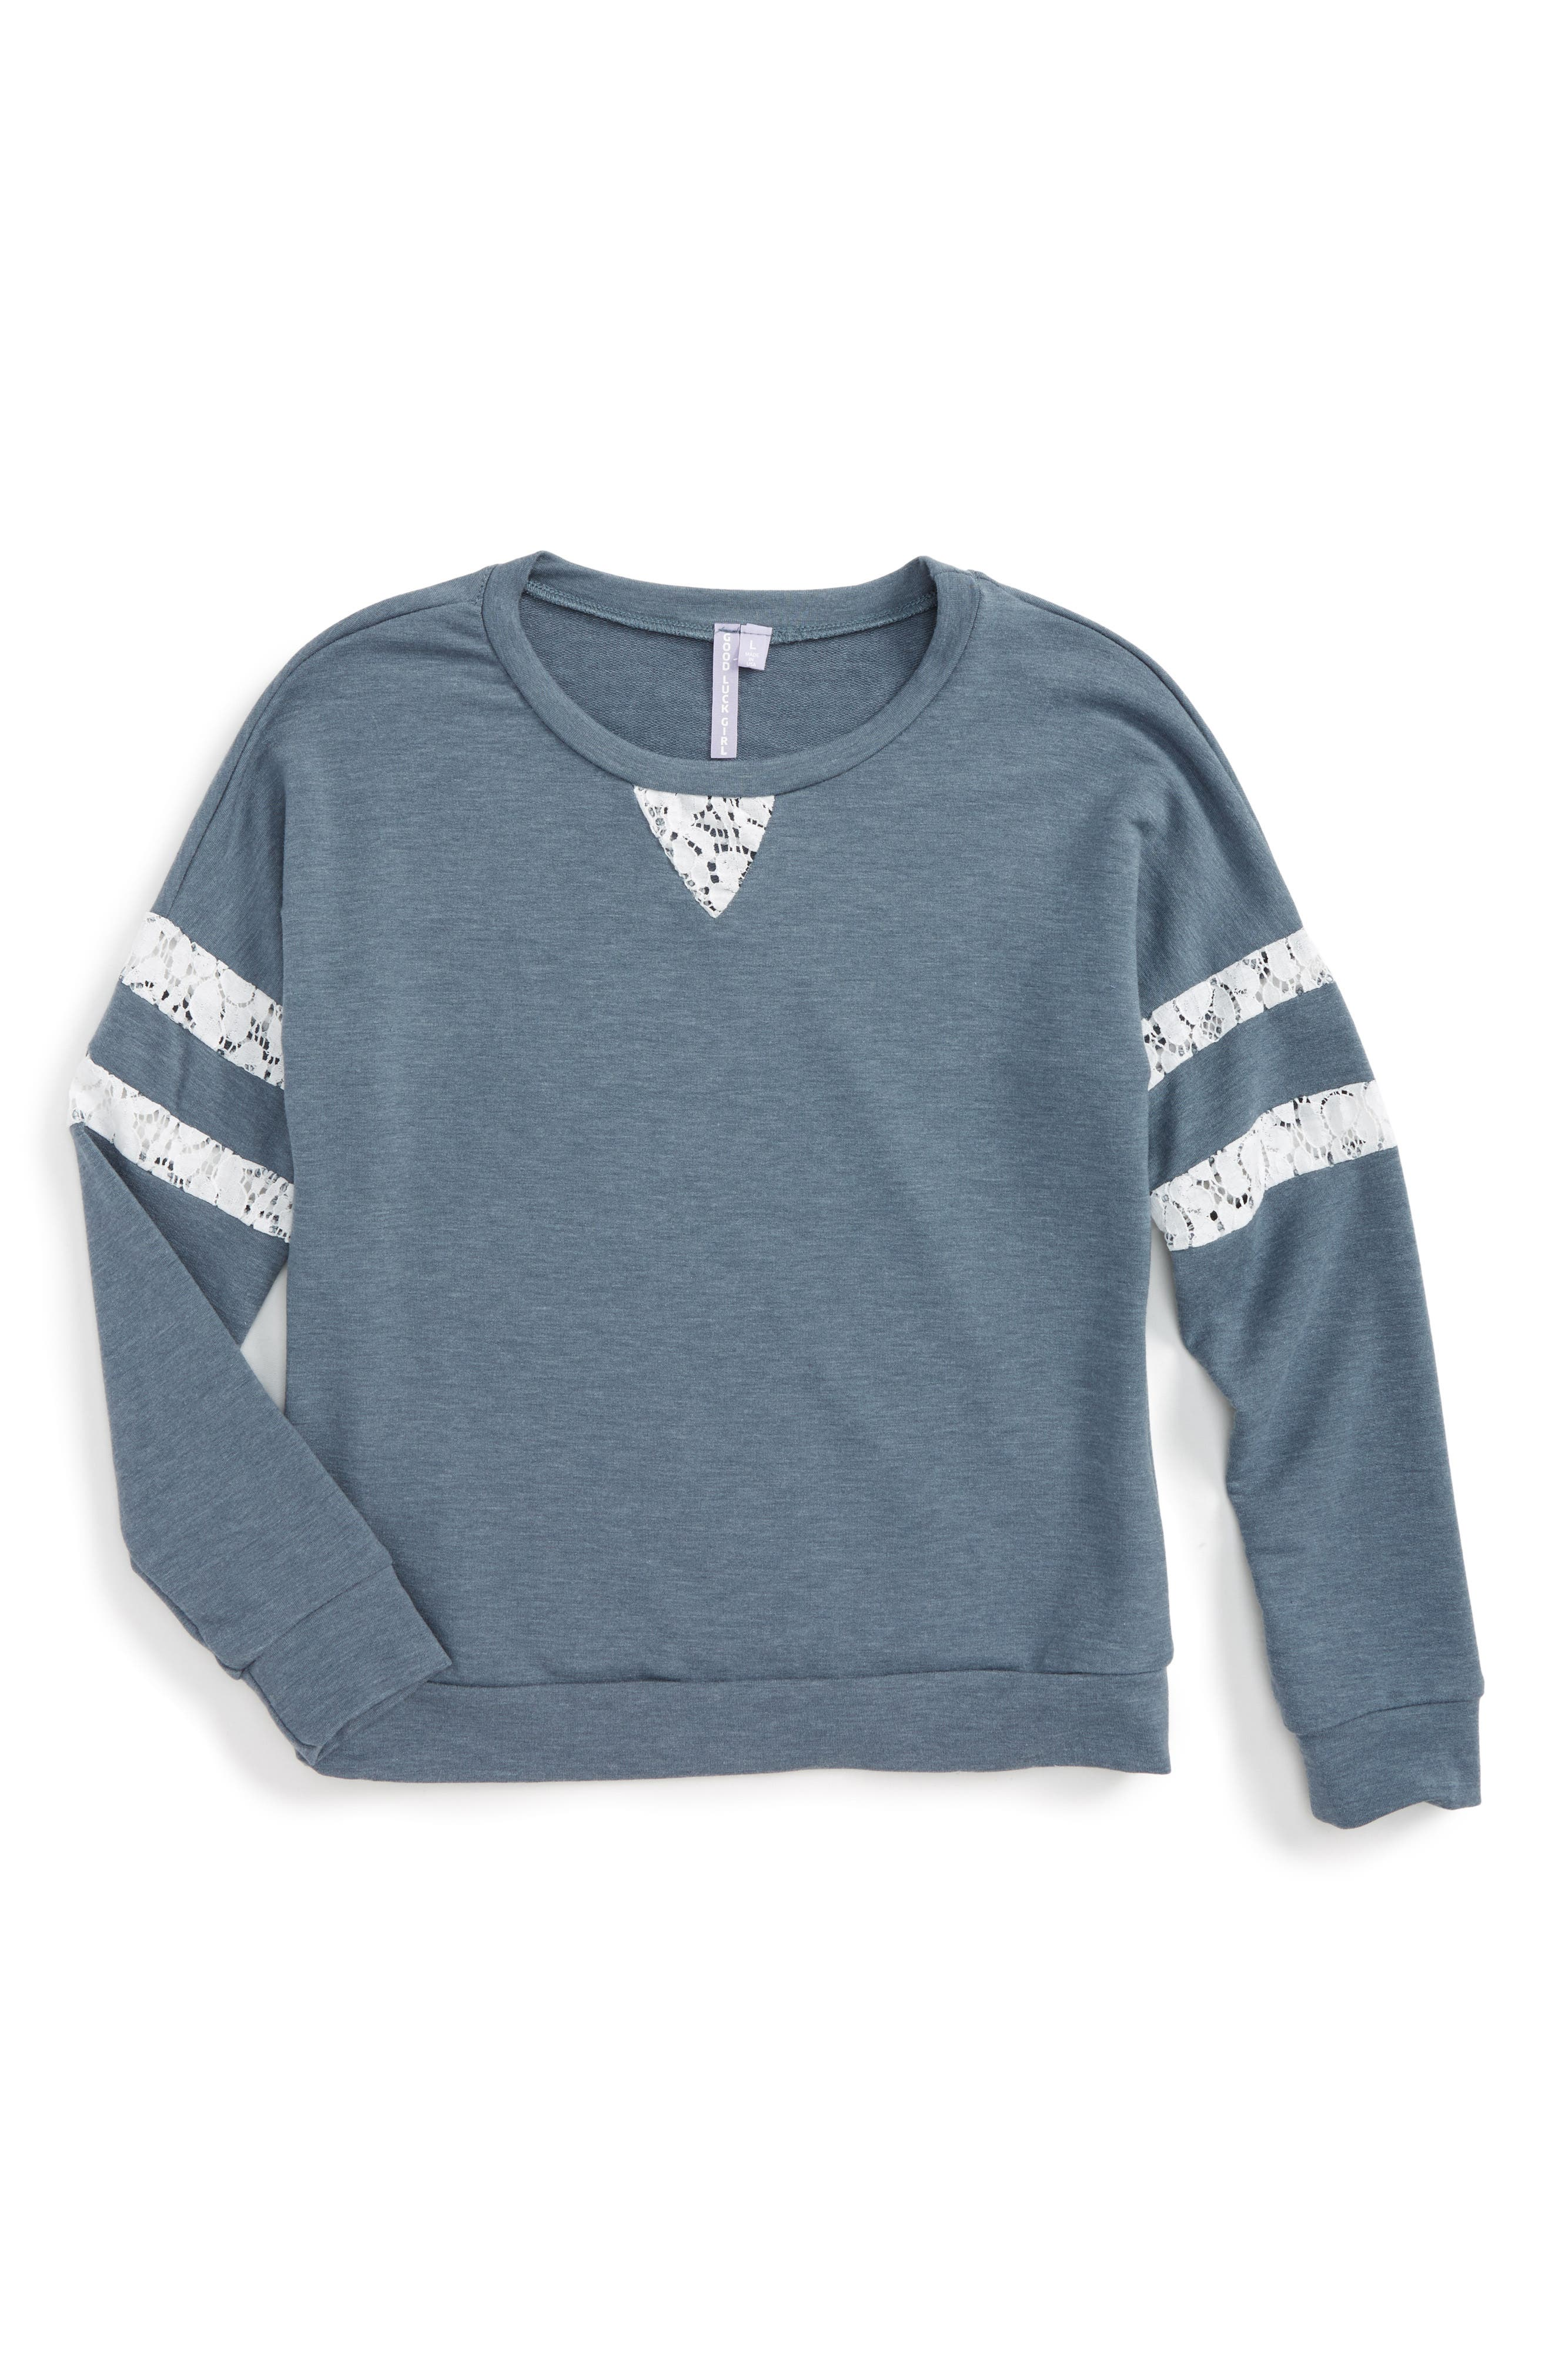 Lace Inset Sweatshirt,                         Main,                         color, 421